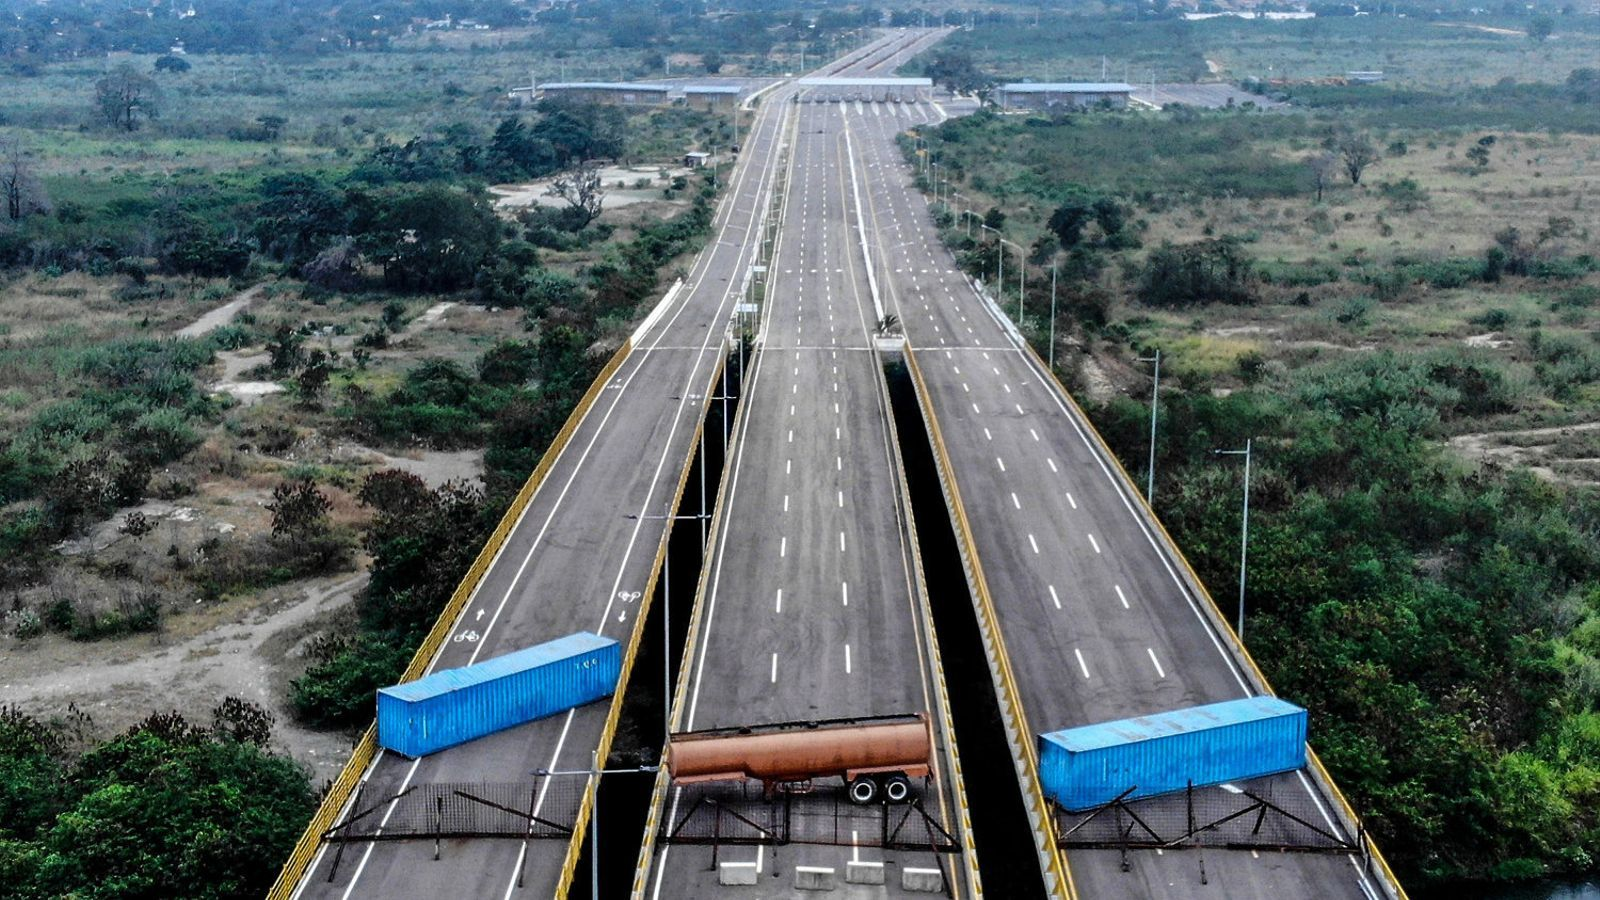 Maduro bloqueja l'ajuda humanitària